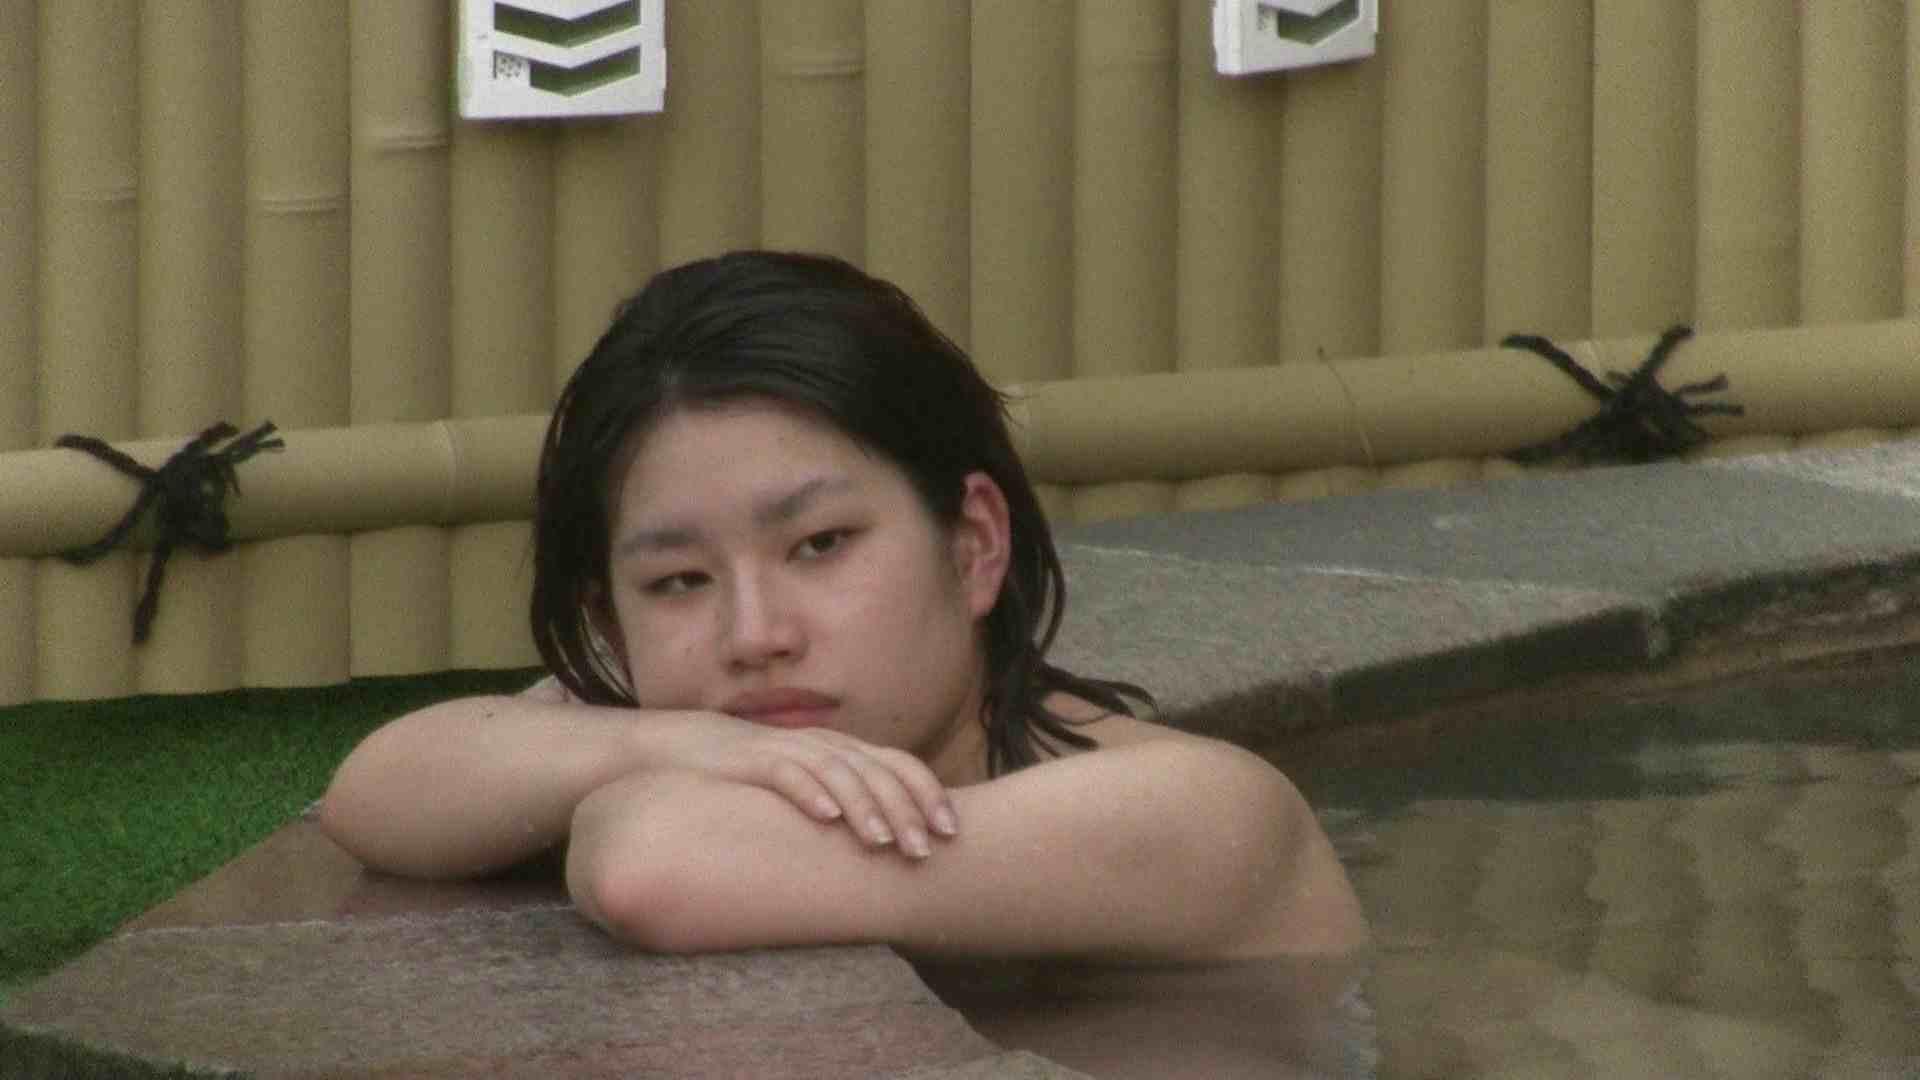 Aquaな露天風呂Vol.230 盗撮 | OLセックス  96画像 37